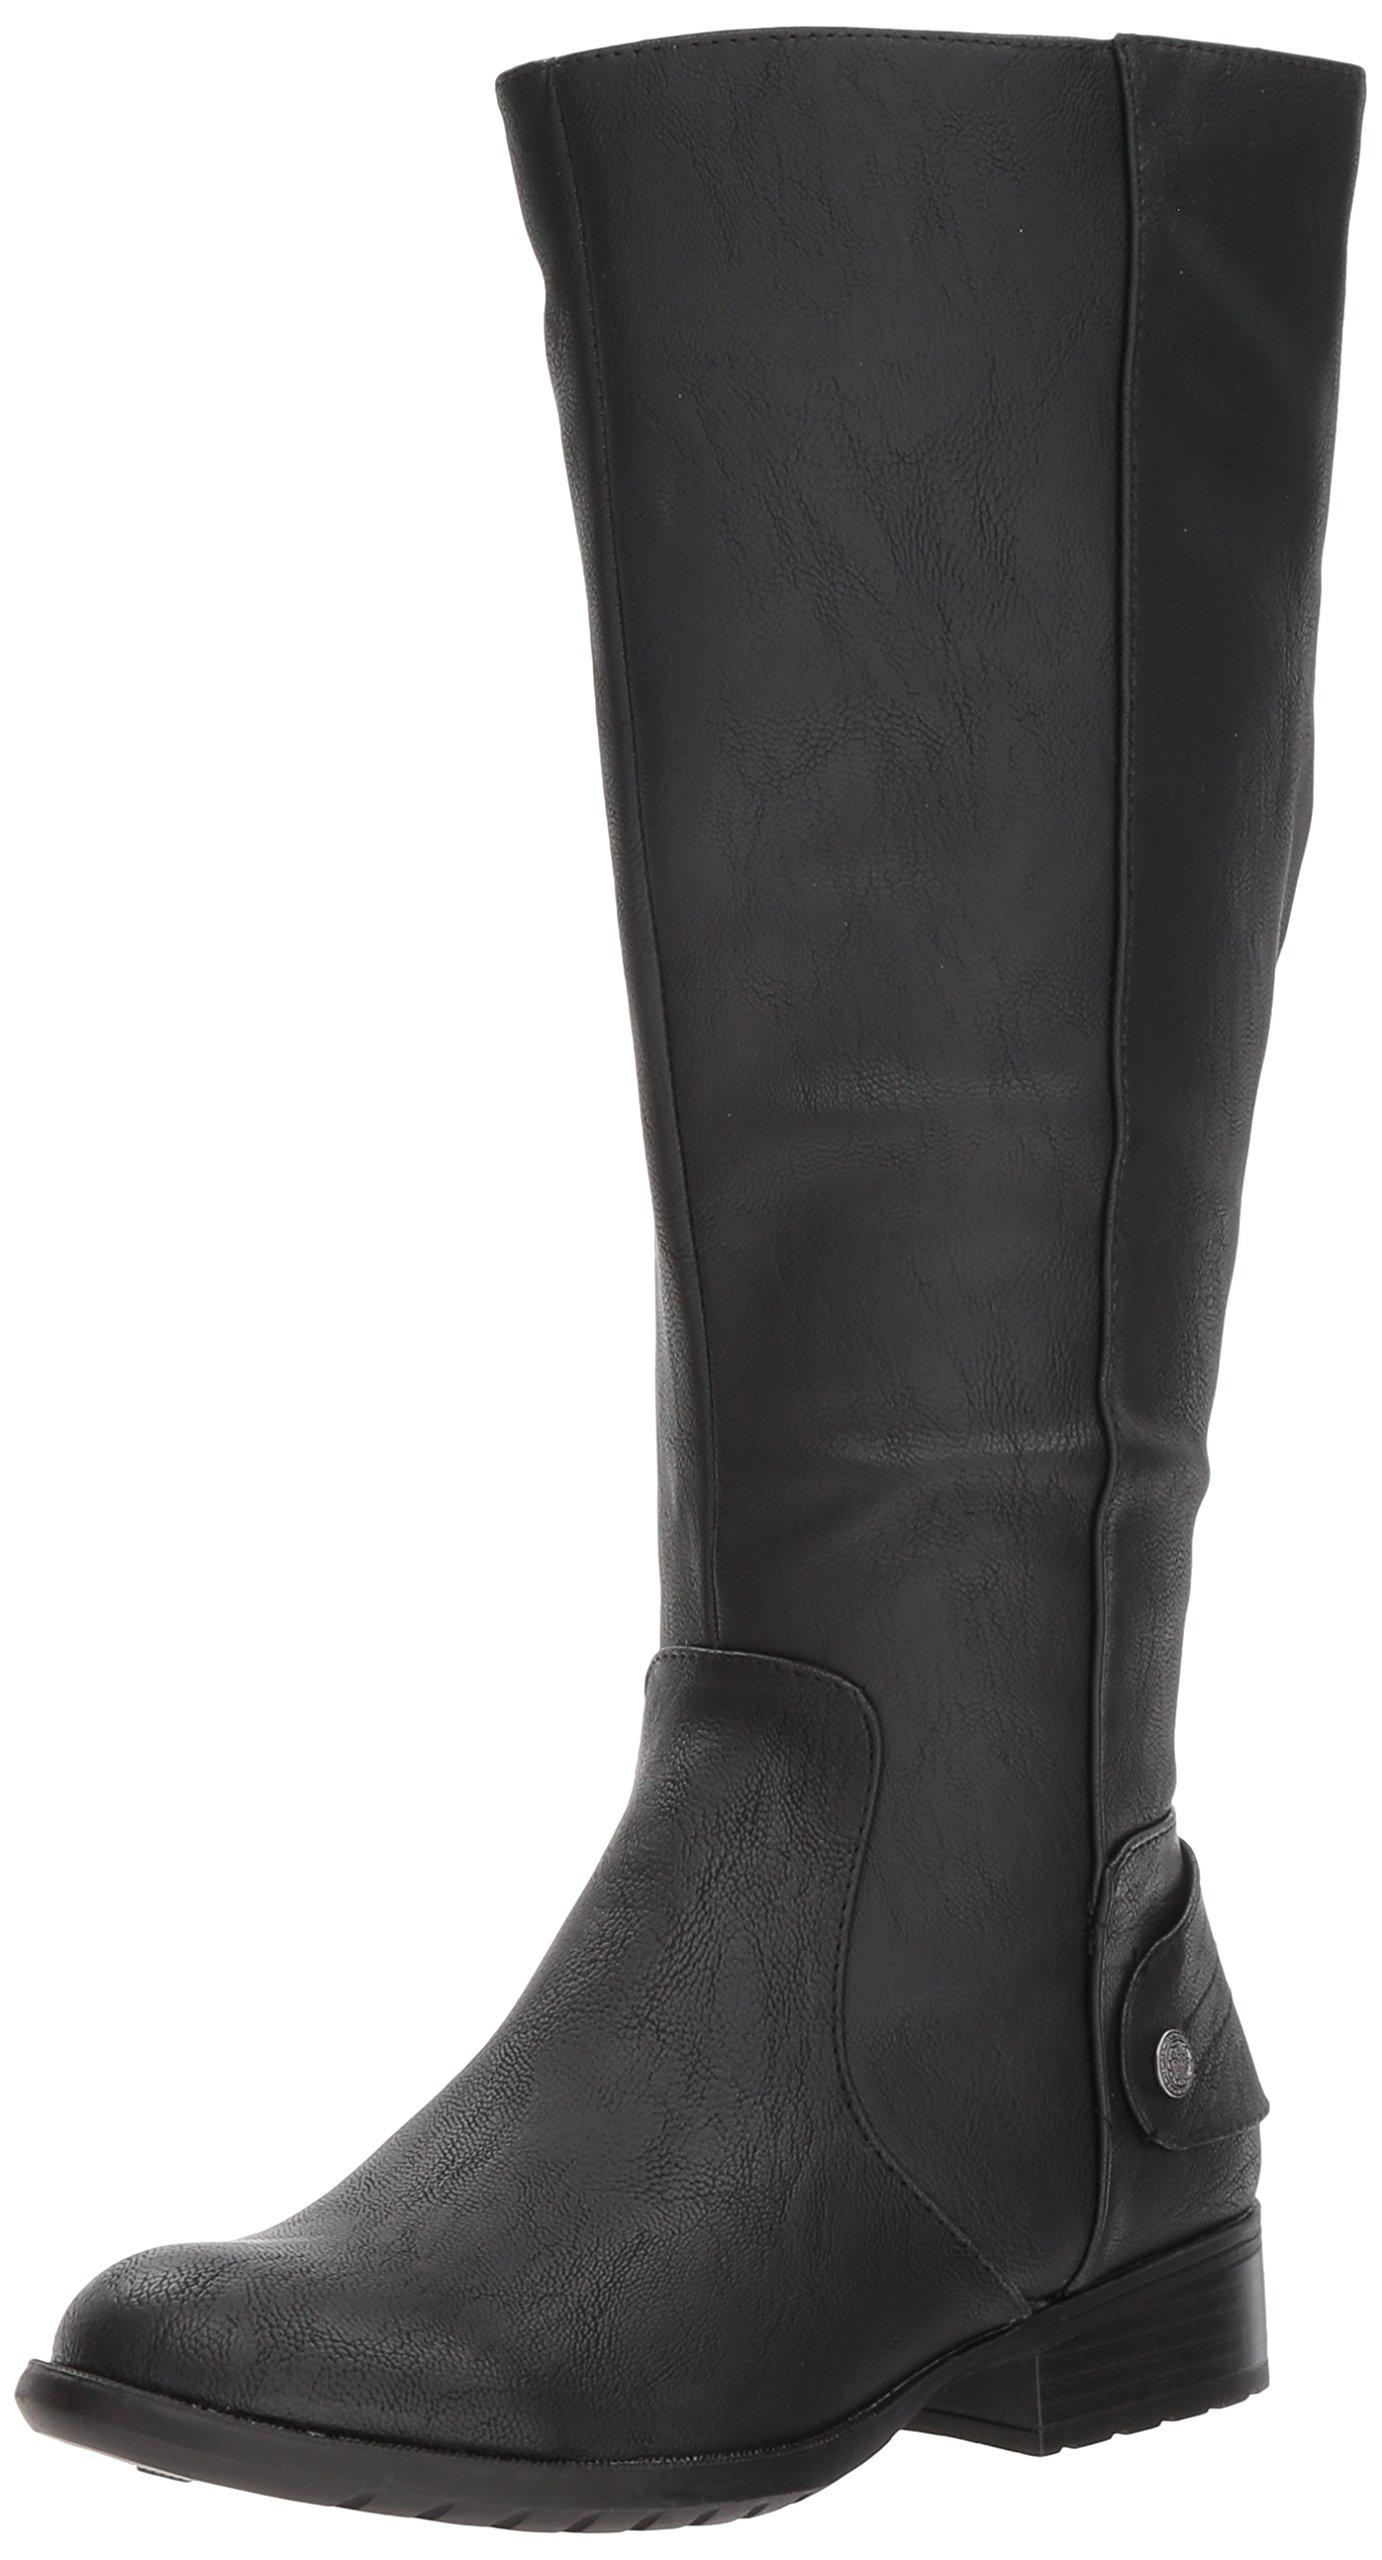 LifeStride Women's Xandywc Equestrian Boot, Black Wc, 6.5 M US